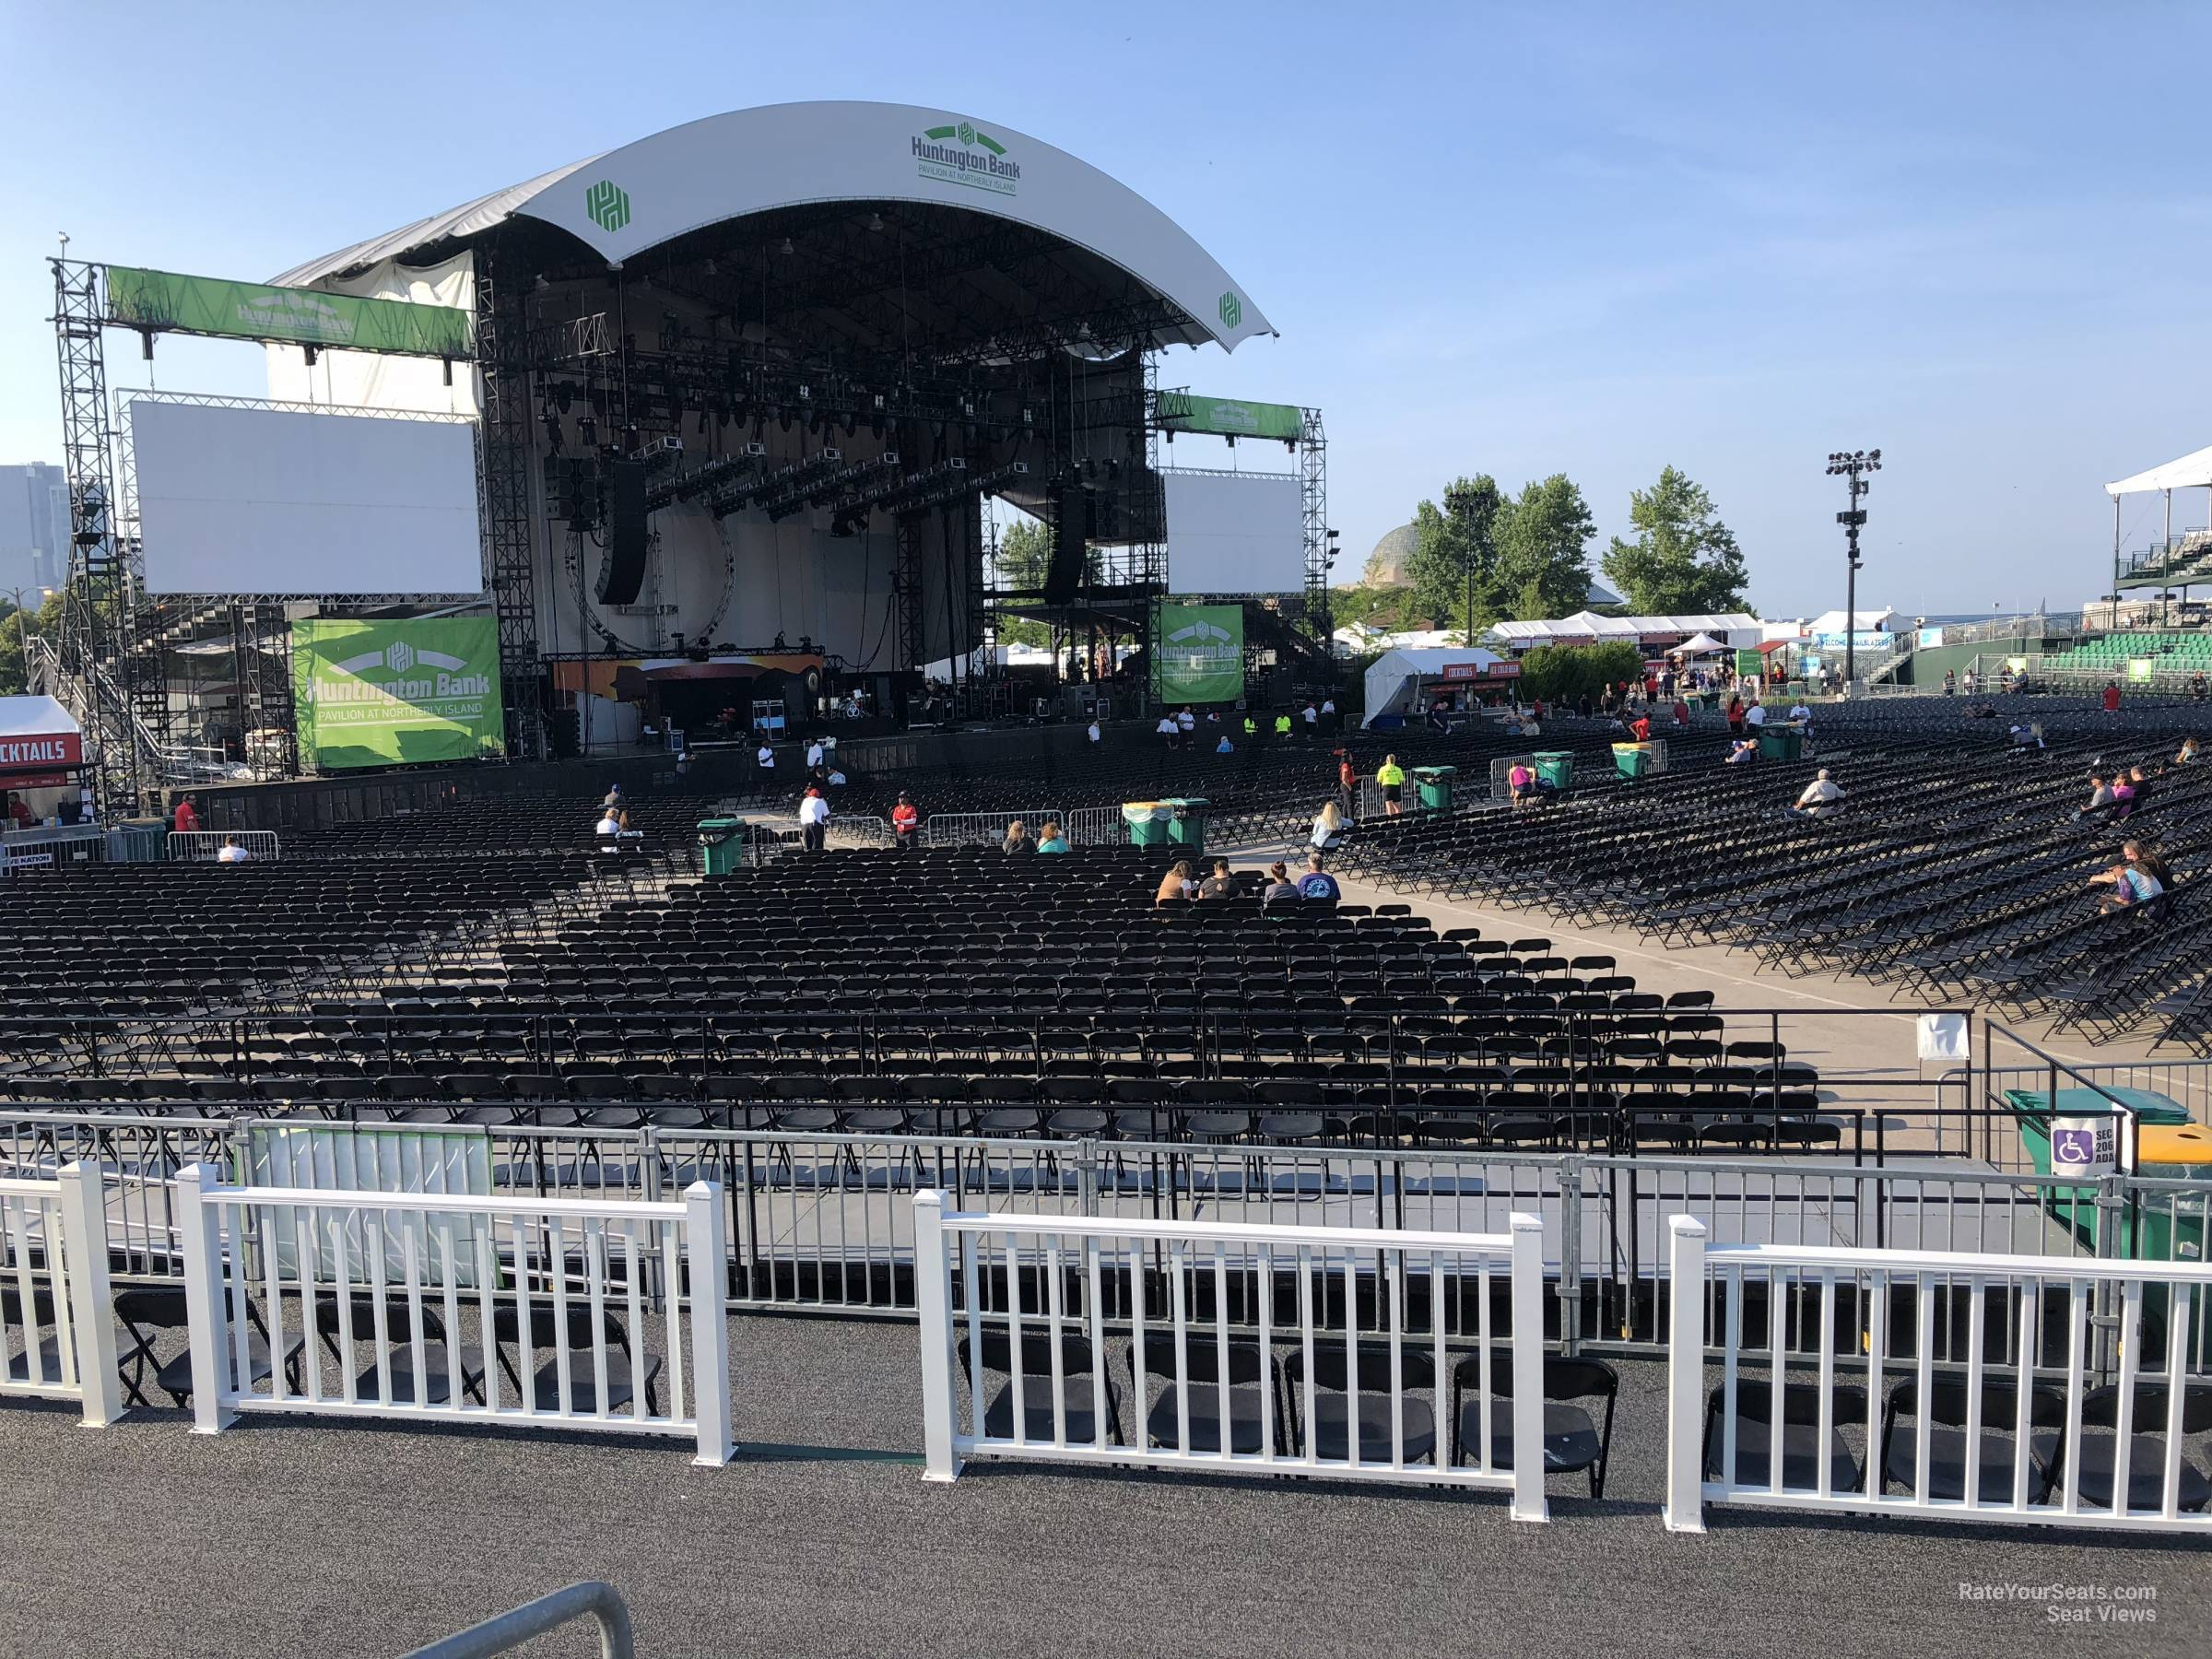 Concert Seat View For Huntington Bank Pavilion Section 310